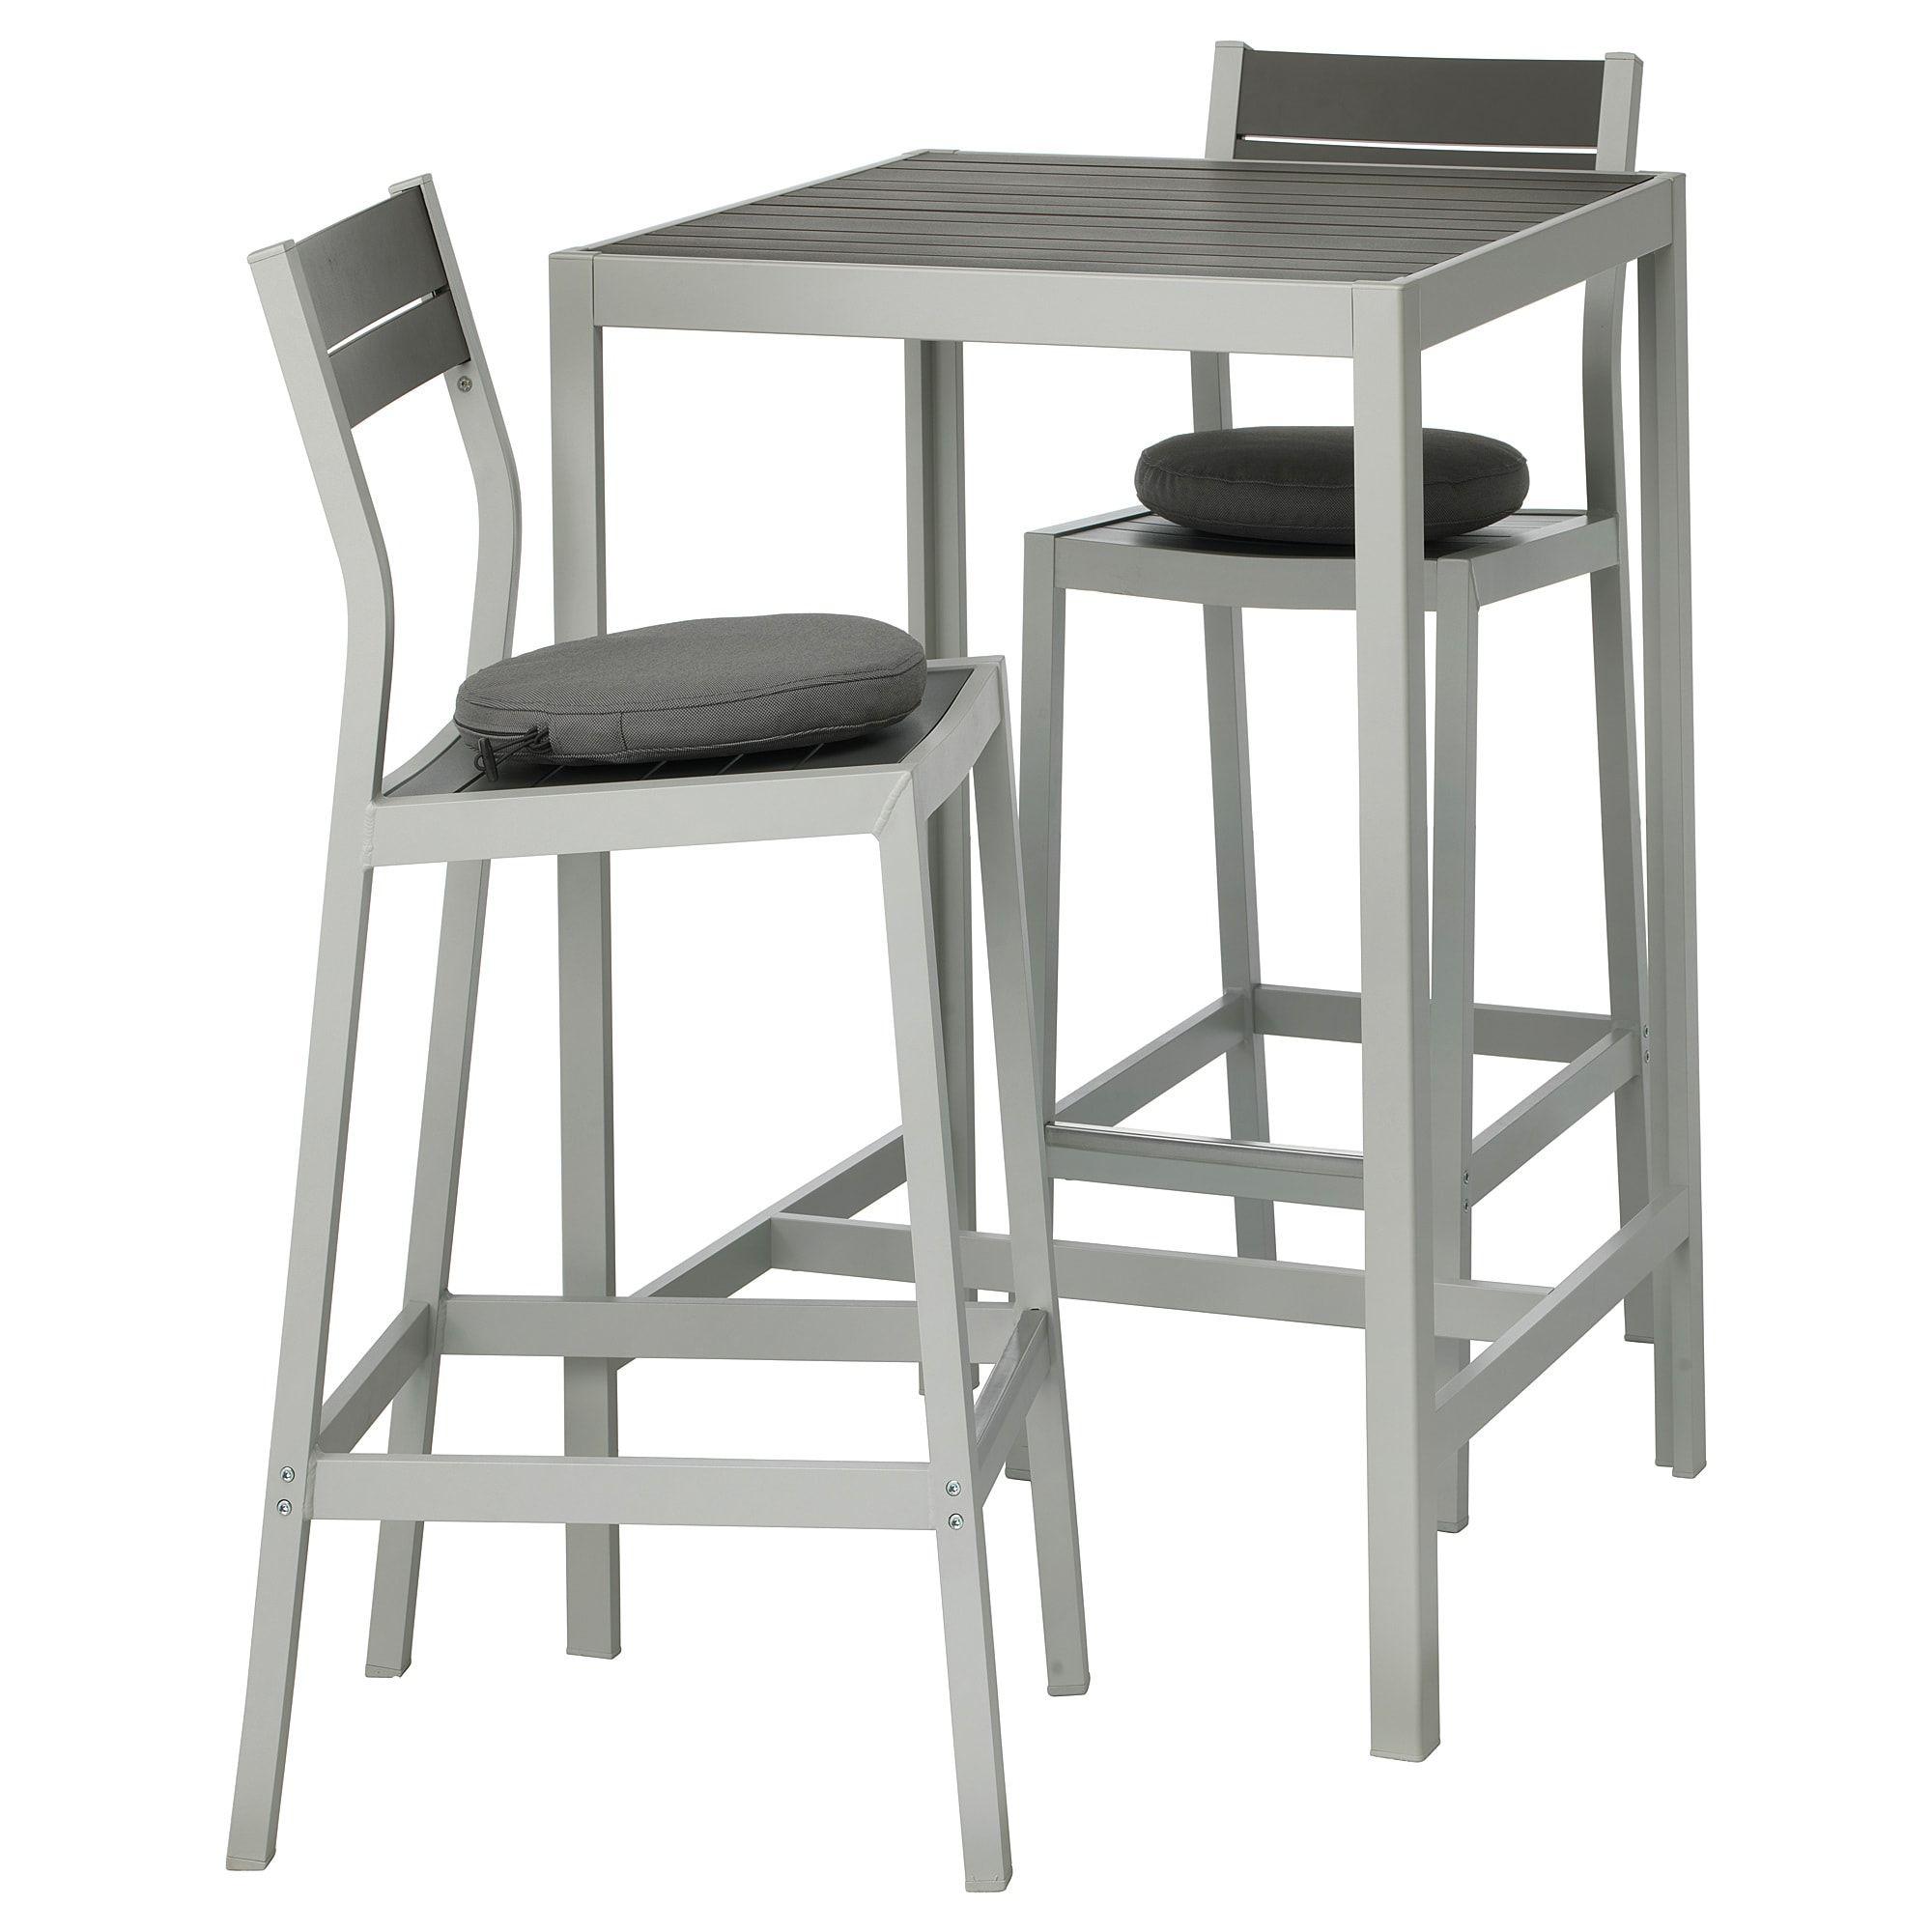 Sjalland Bar Table And 2 Bar Stools Outdoor Dark Gray Froson